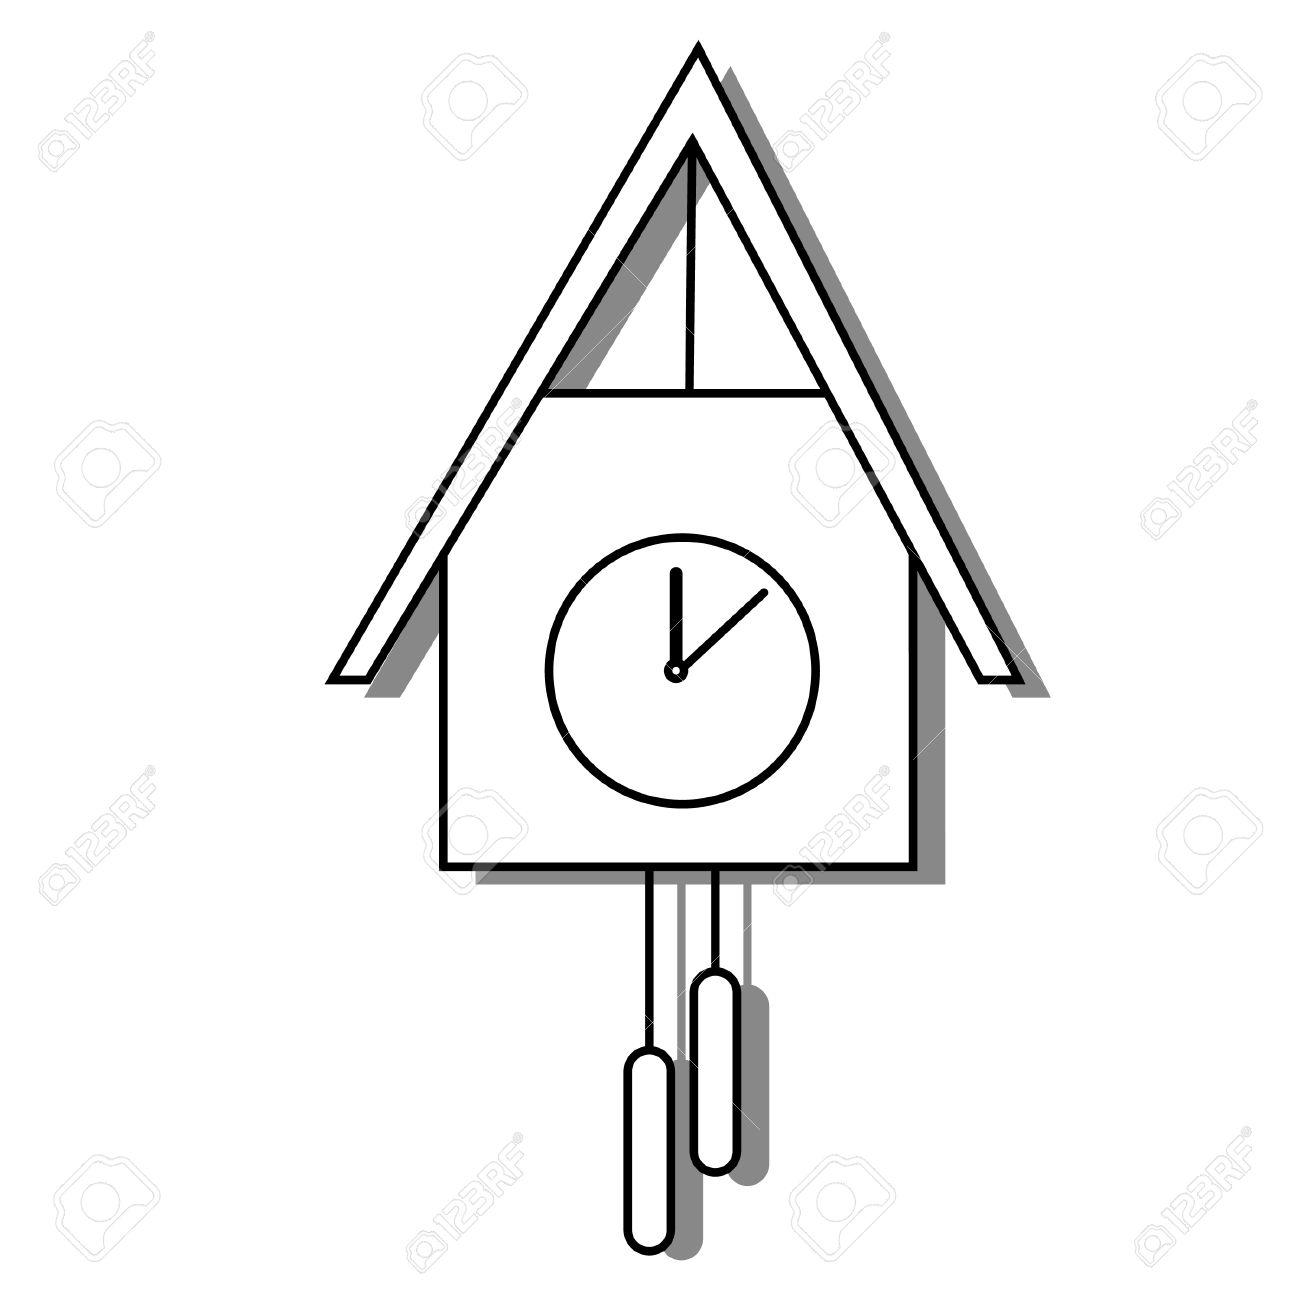 1300x1300 Cuckoo Clock Vector Outline Drawing, Bird Clock, Old Clock Royalty